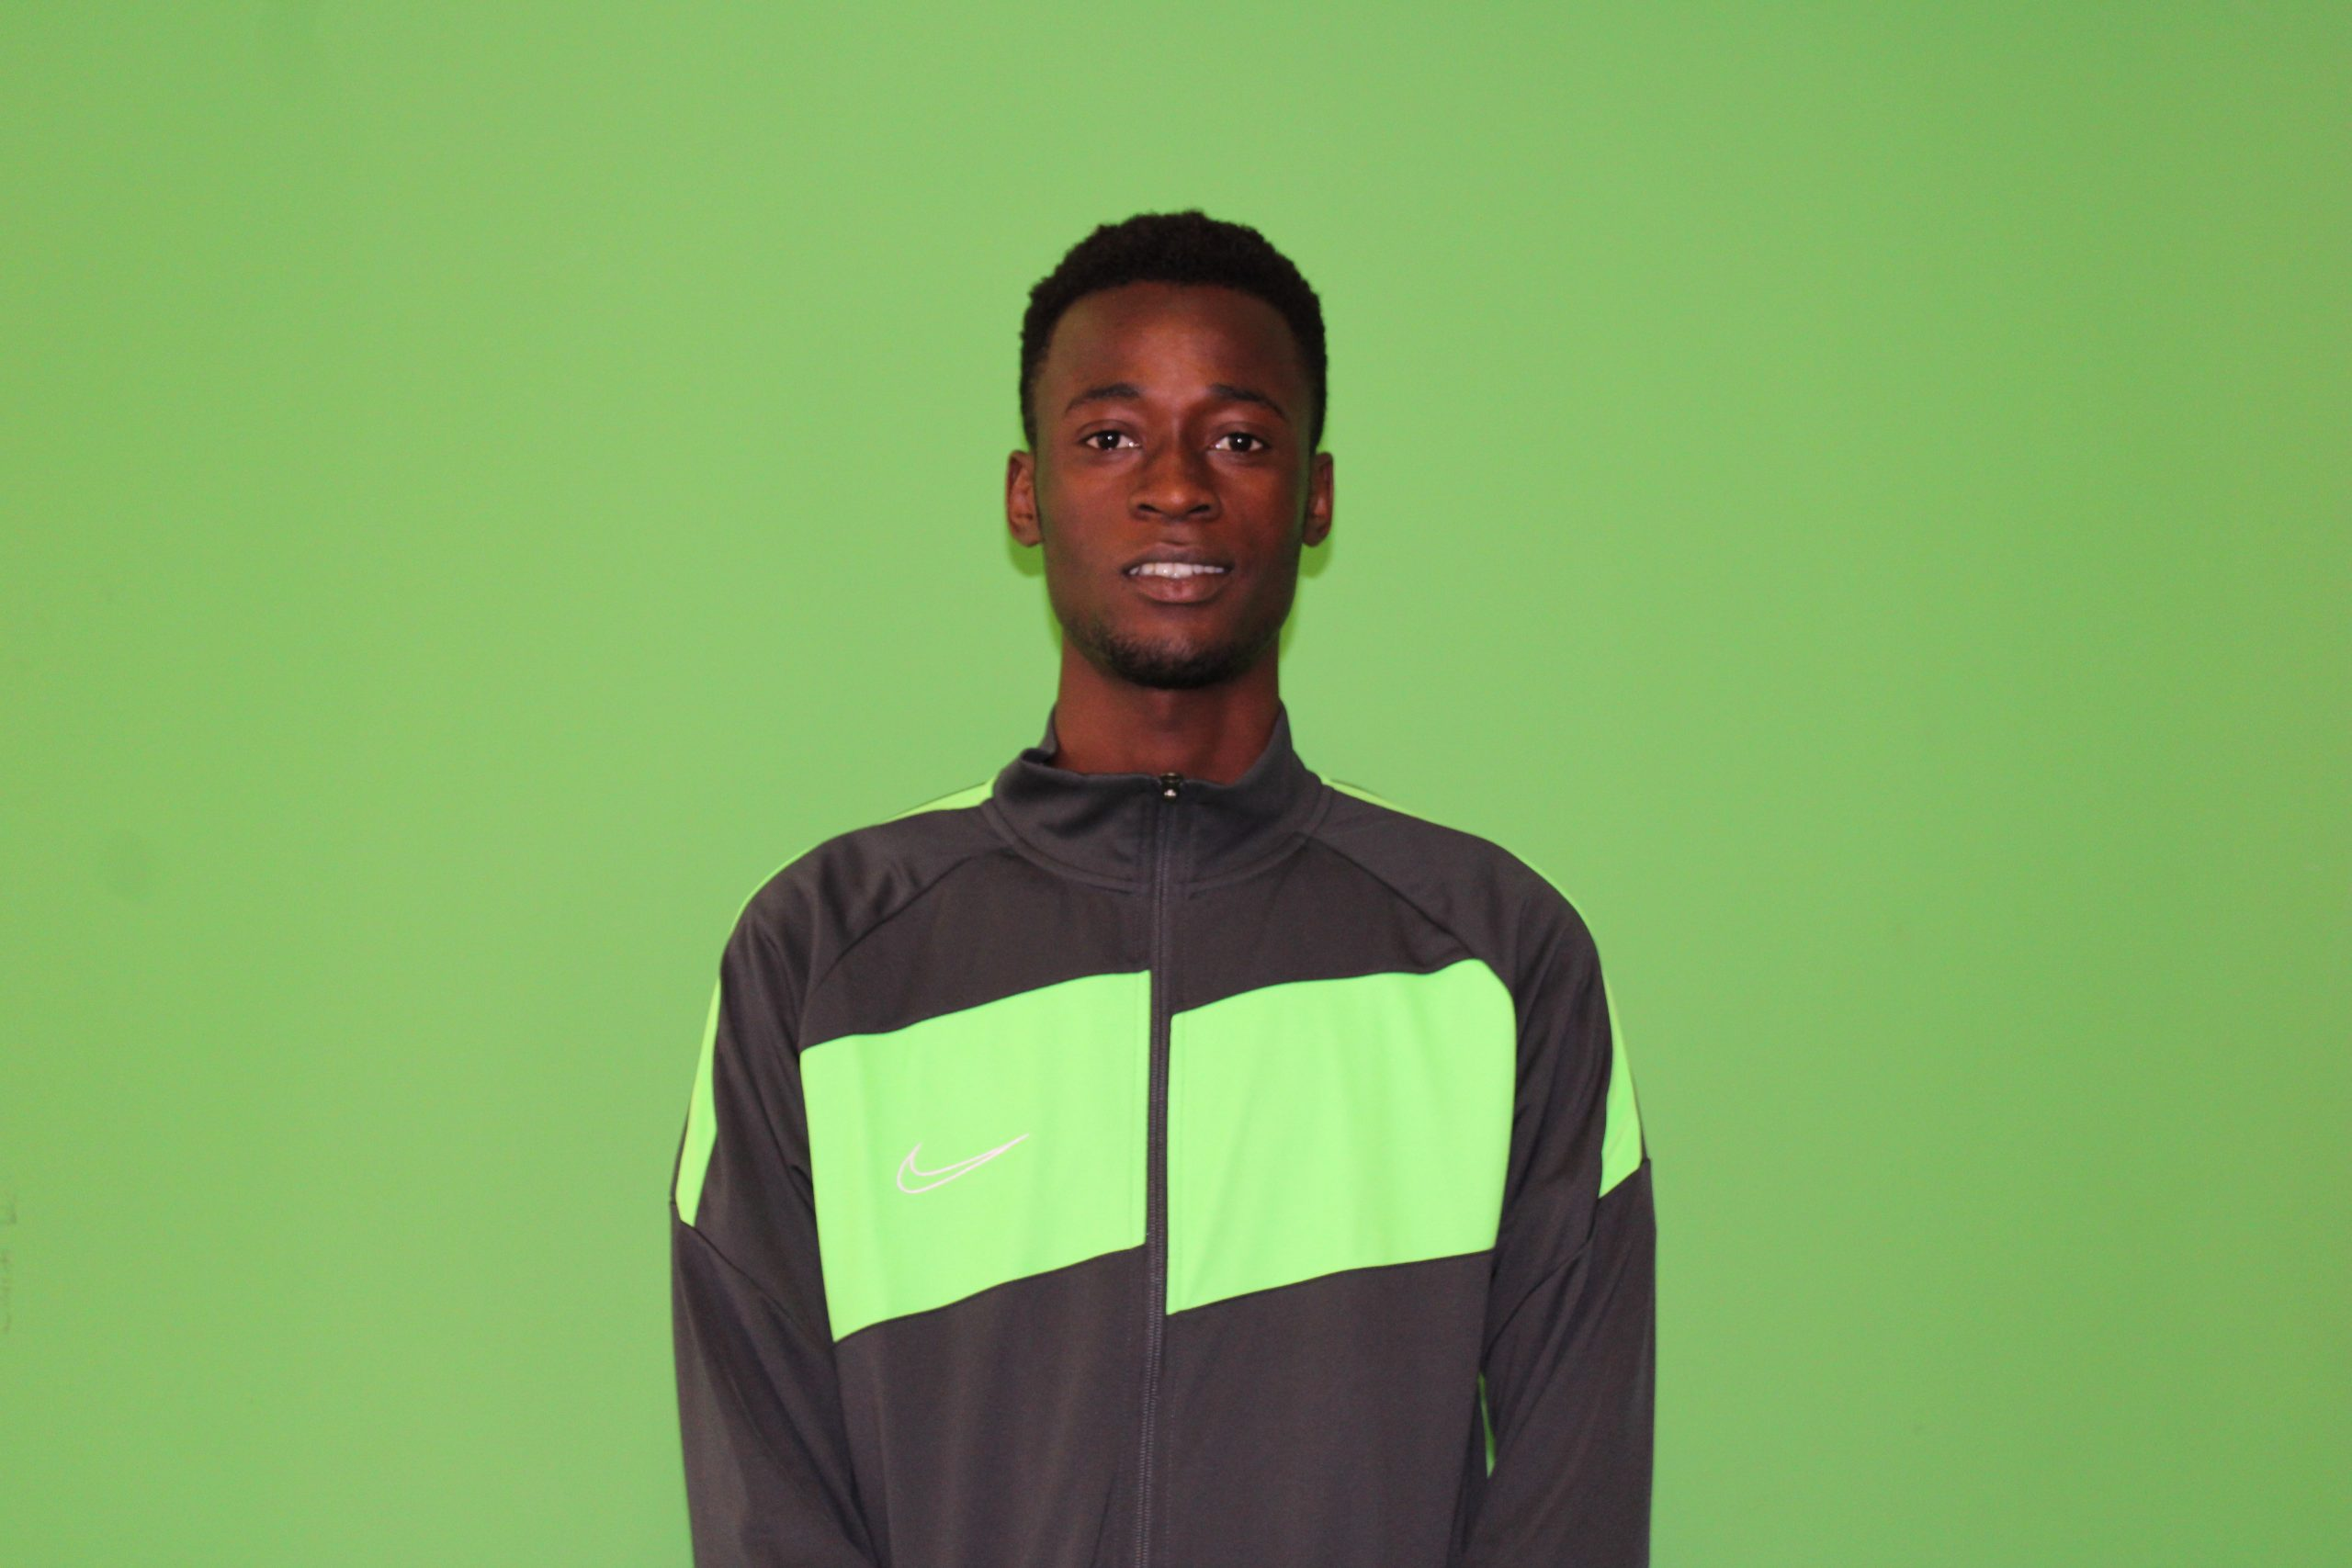 http://usepmm.fr/wp-content/uploads/2020/07/DIALLO-Thierno-Ibrahima-scaled.jpg